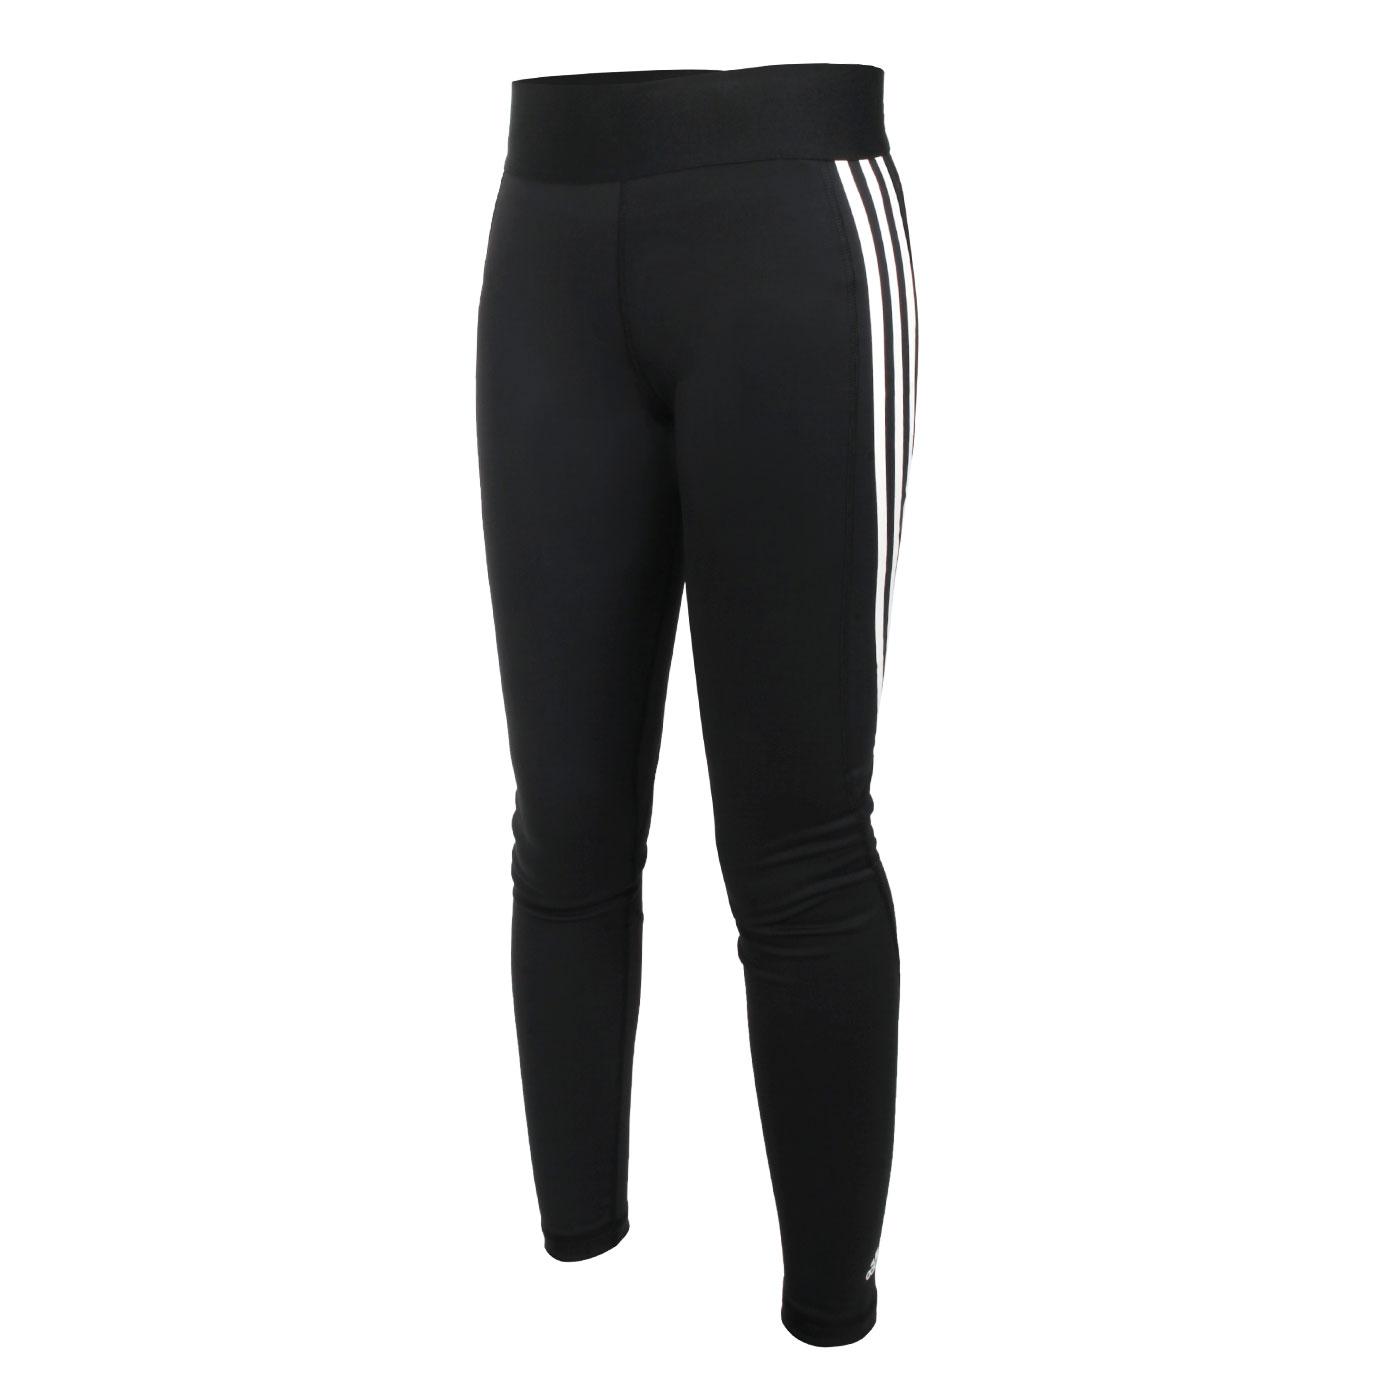 ADIDAS 女款緊身長褲 FJ7173 - 黑白